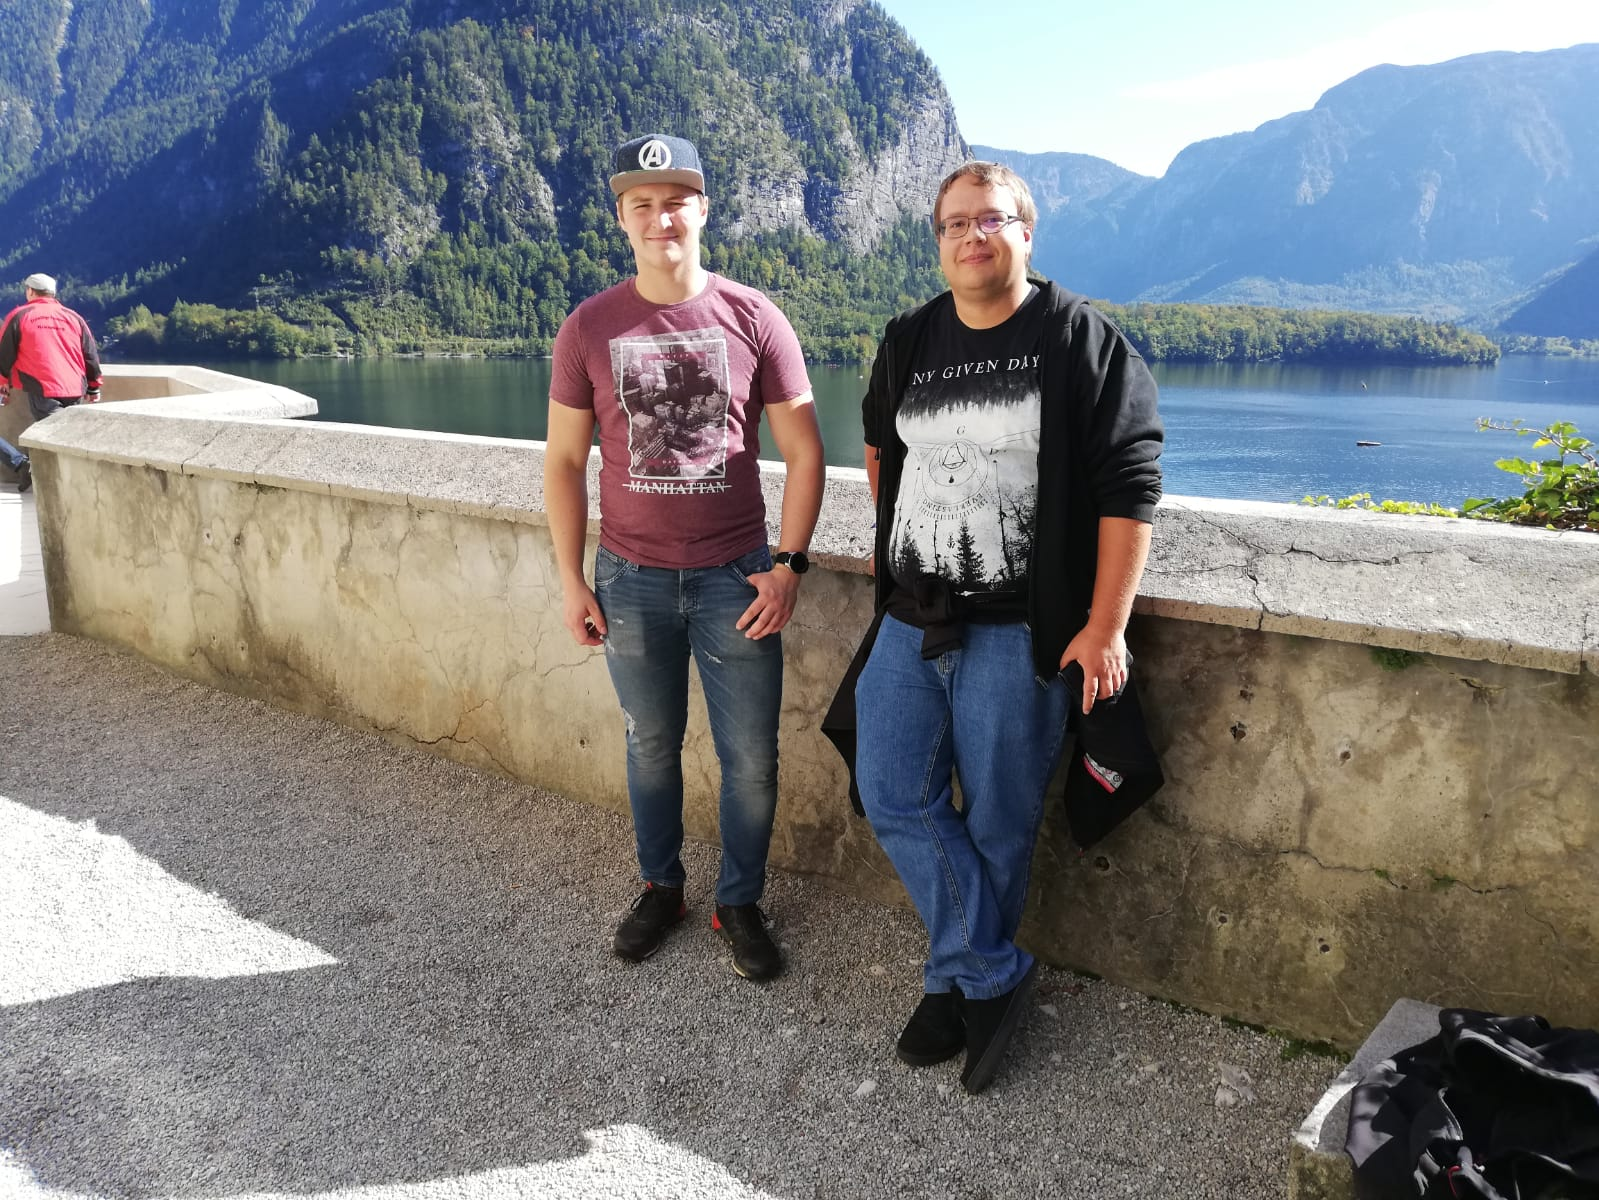 Vereinsausflug 2019 – Fabian Seidl und Patrick Praml